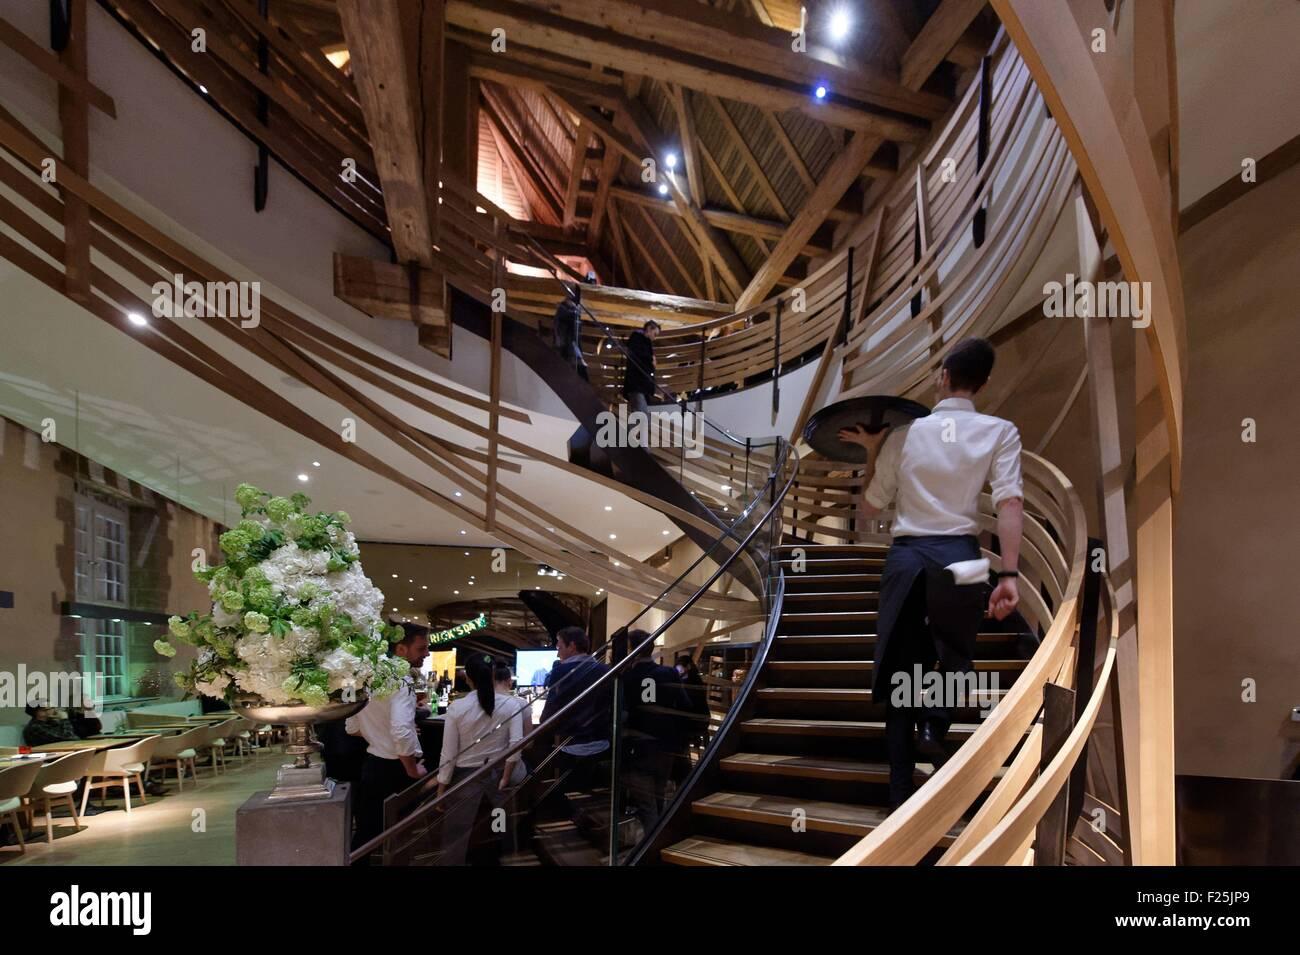 New Restaurant Stock Photos & New Restaurant Stock Images - Alamy